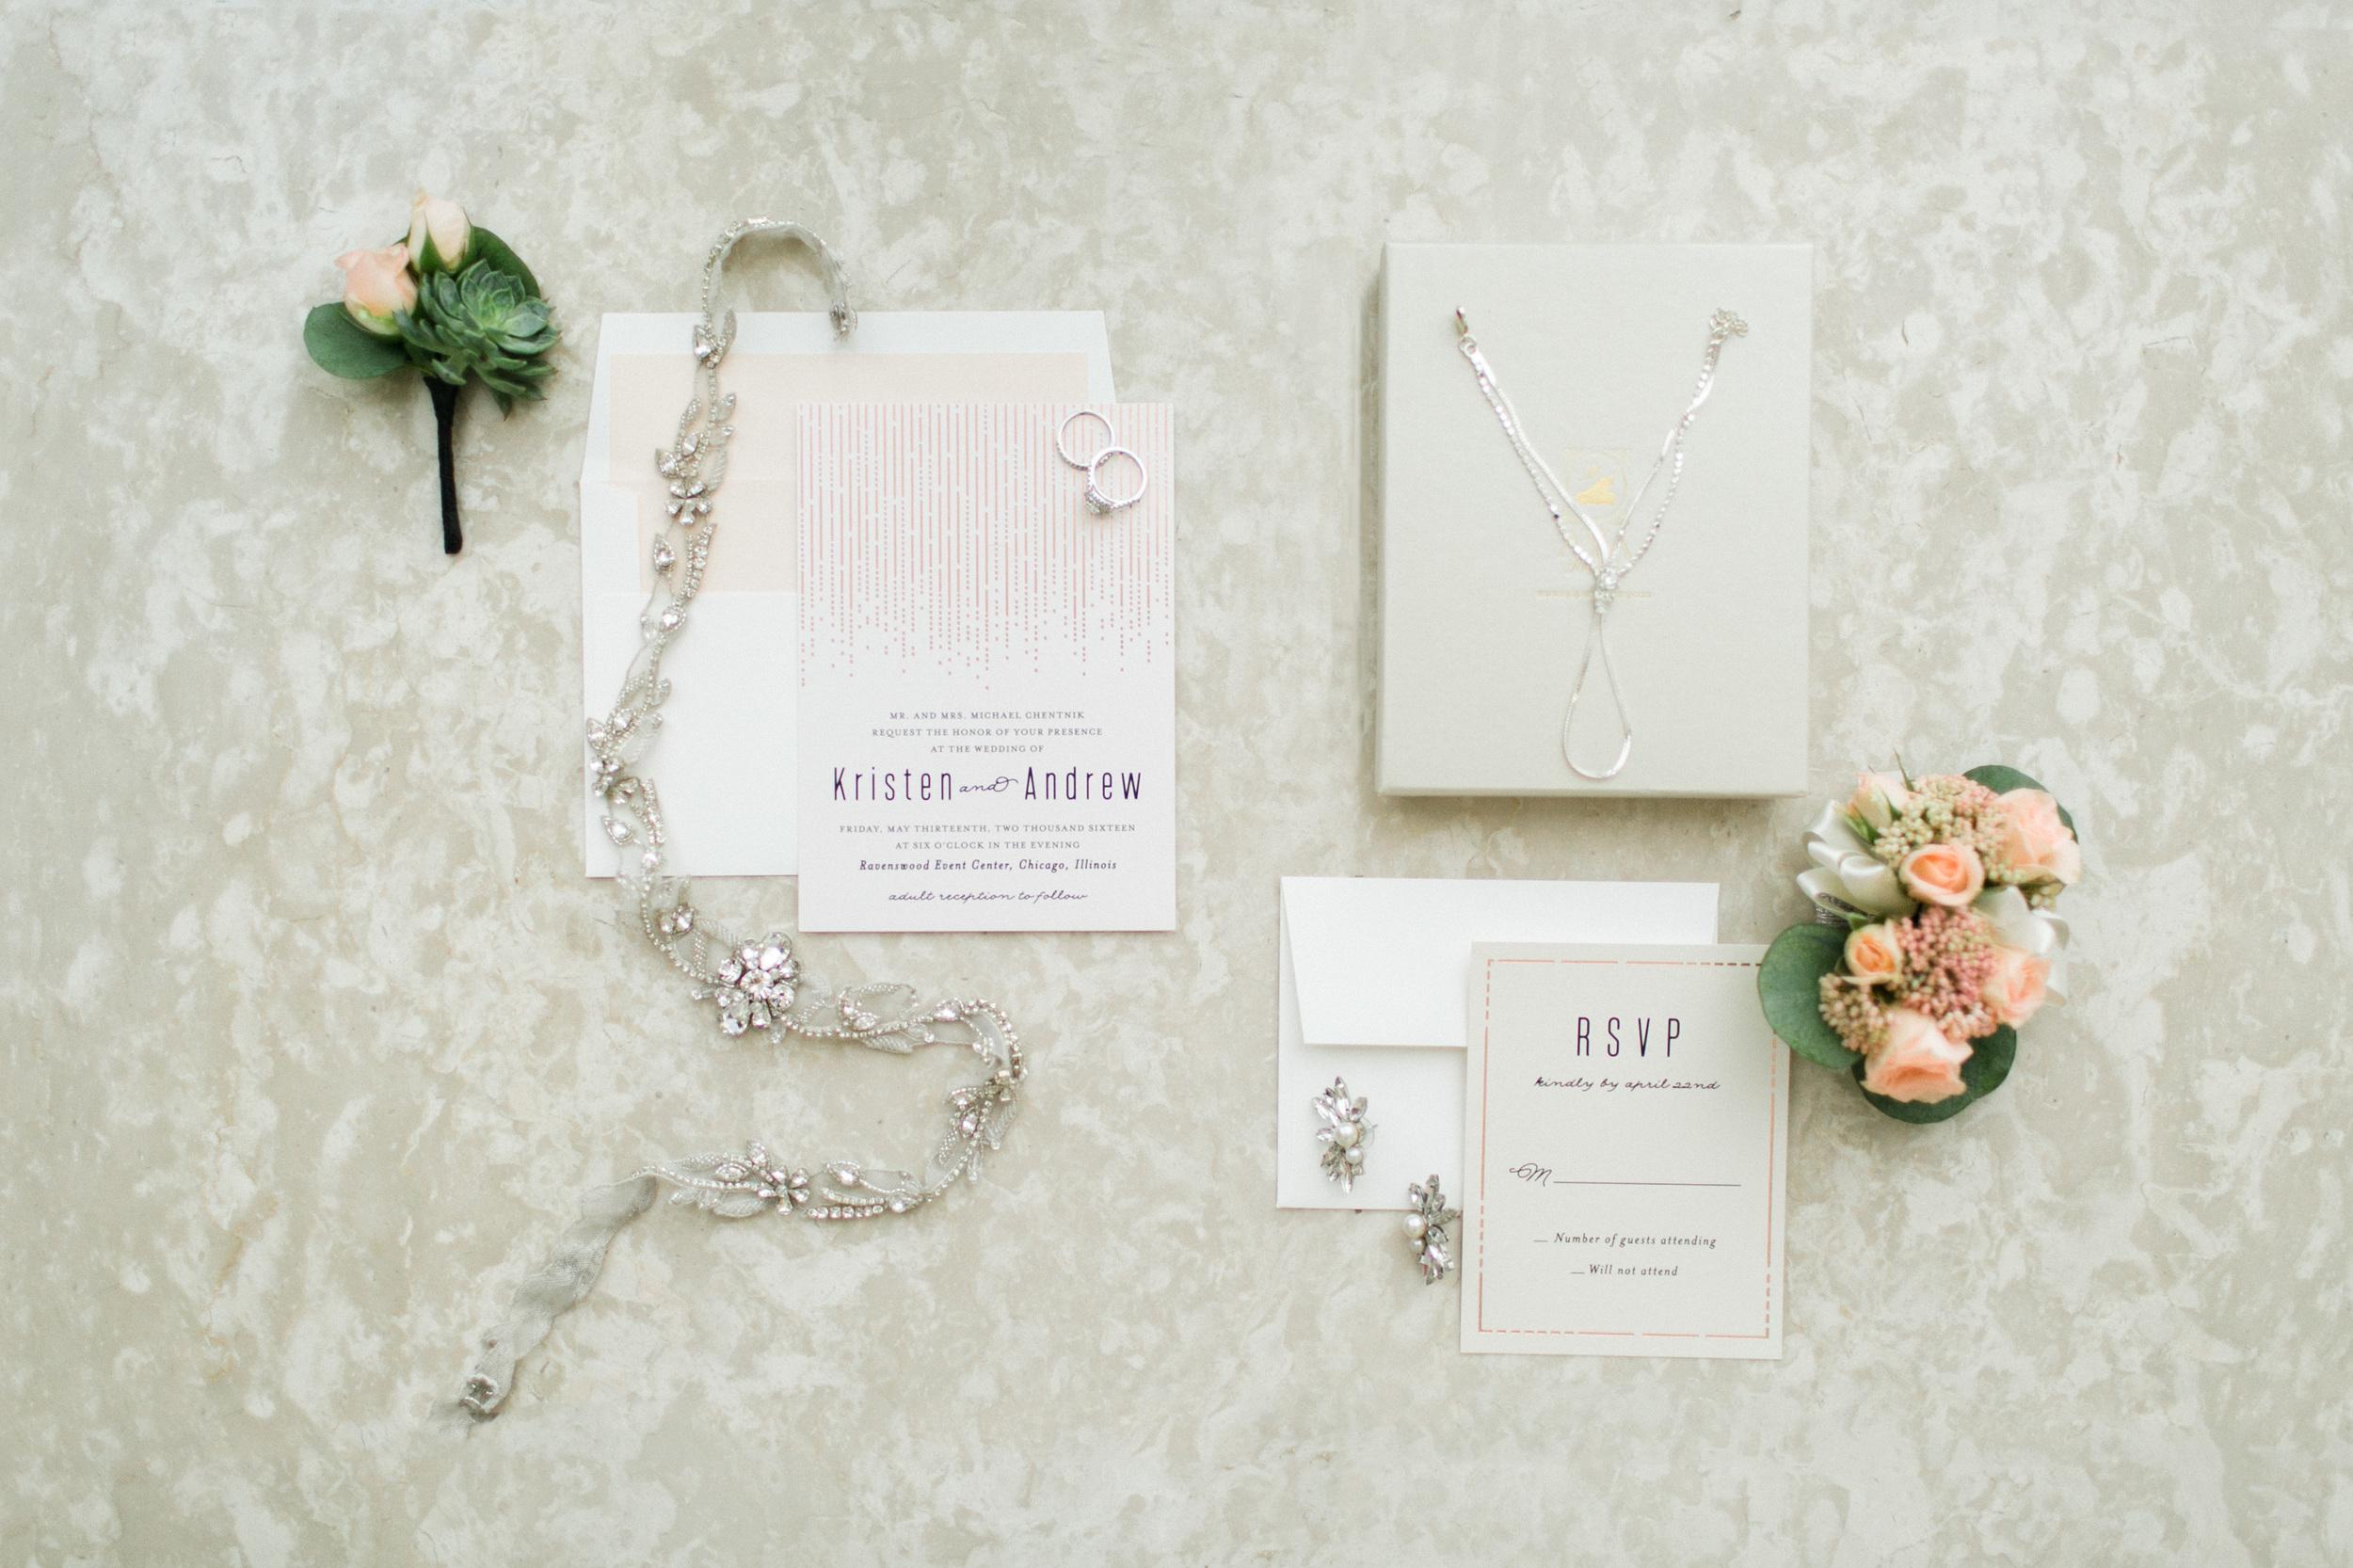 mayden_photography_weddings-17.jpg